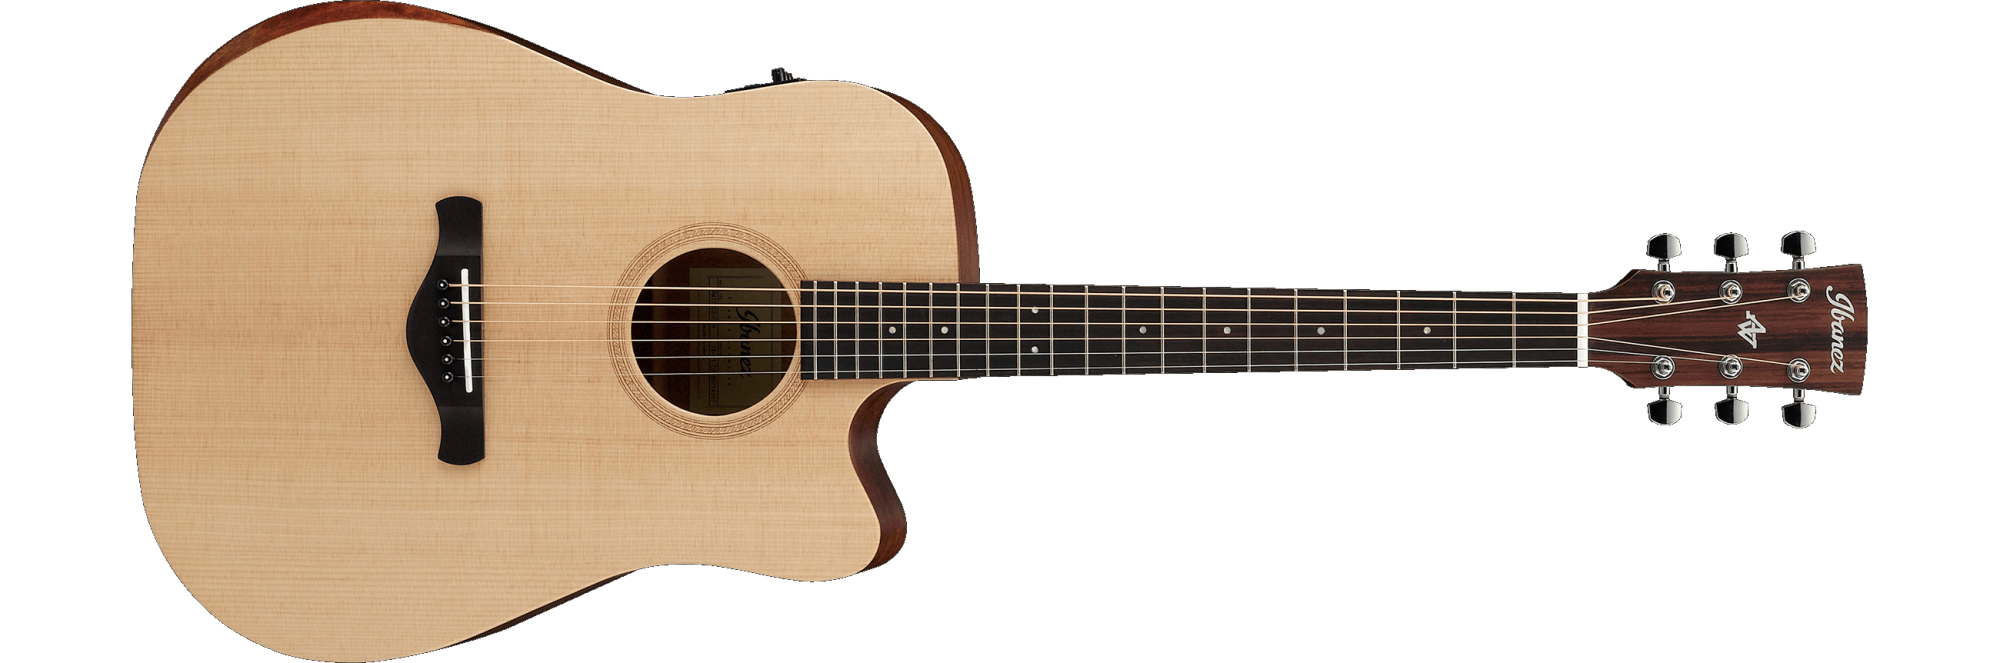 Ibanez Artwood Series Acoustic Electric